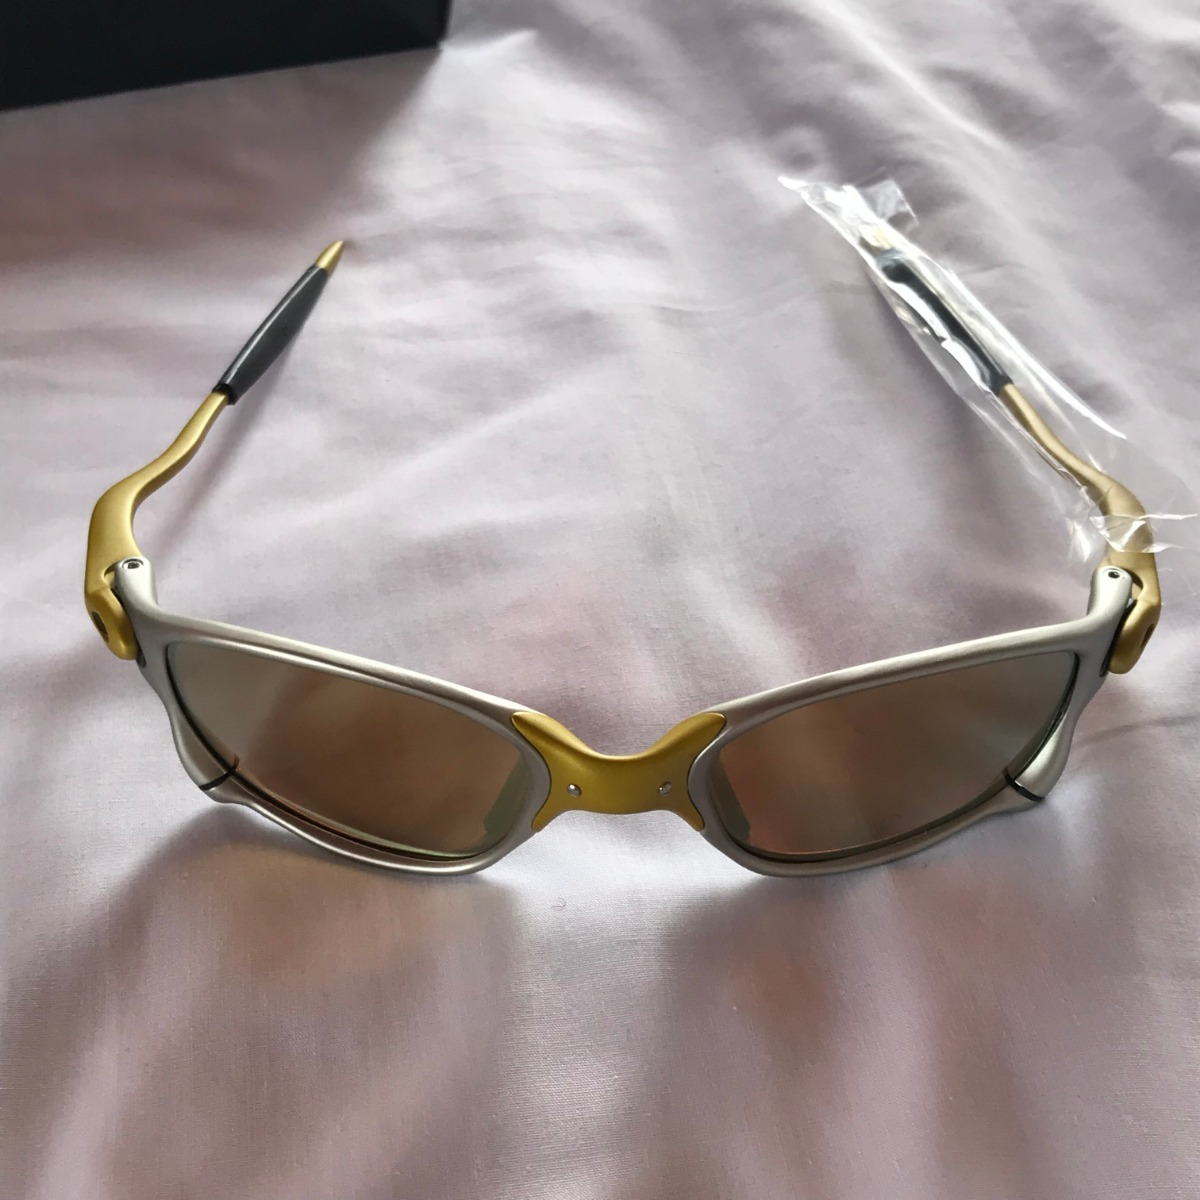 d52ae6dc7 óculos oakley double x 24k lentes gold x metal juliet lupa. Carregando zoom.